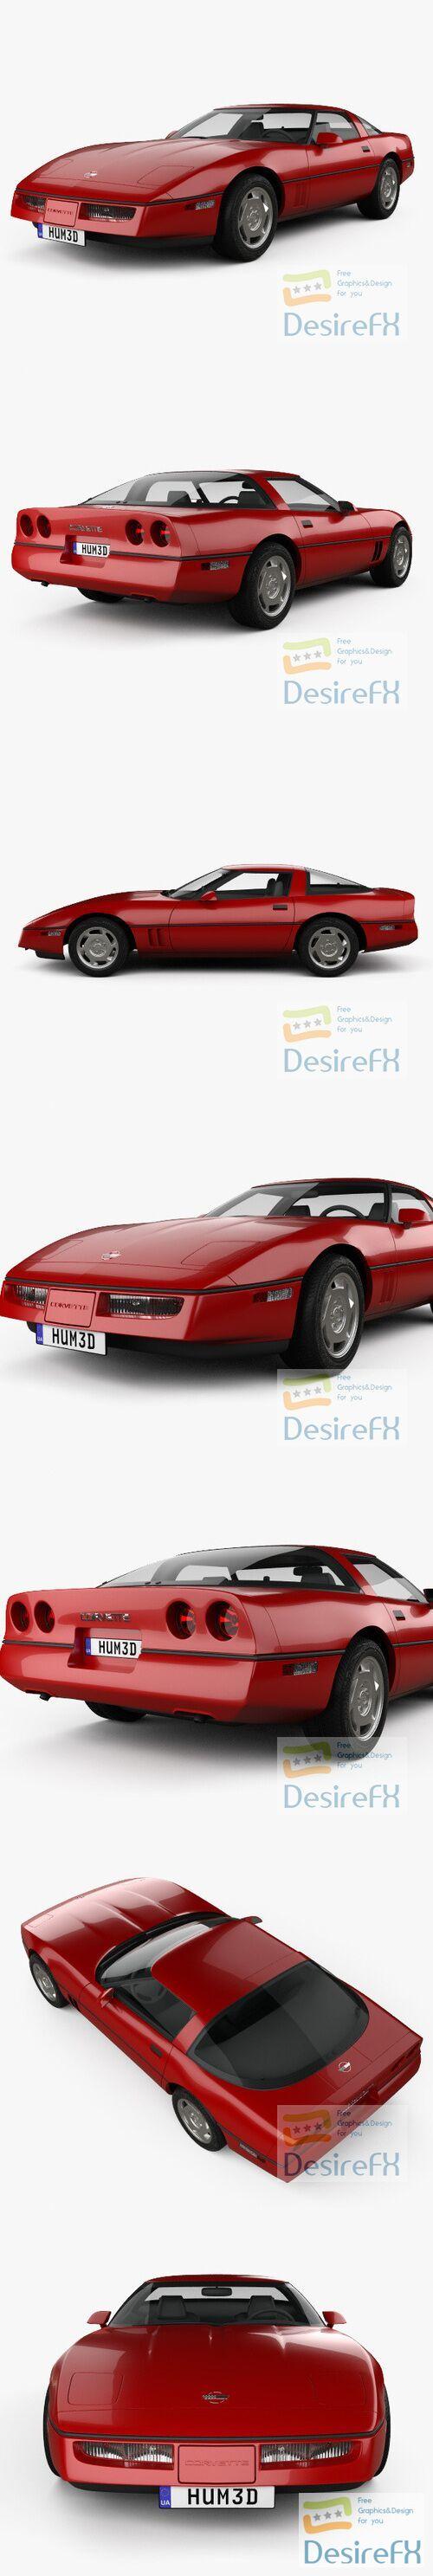 Chevrolet Corvette coupe 1983 3D Model